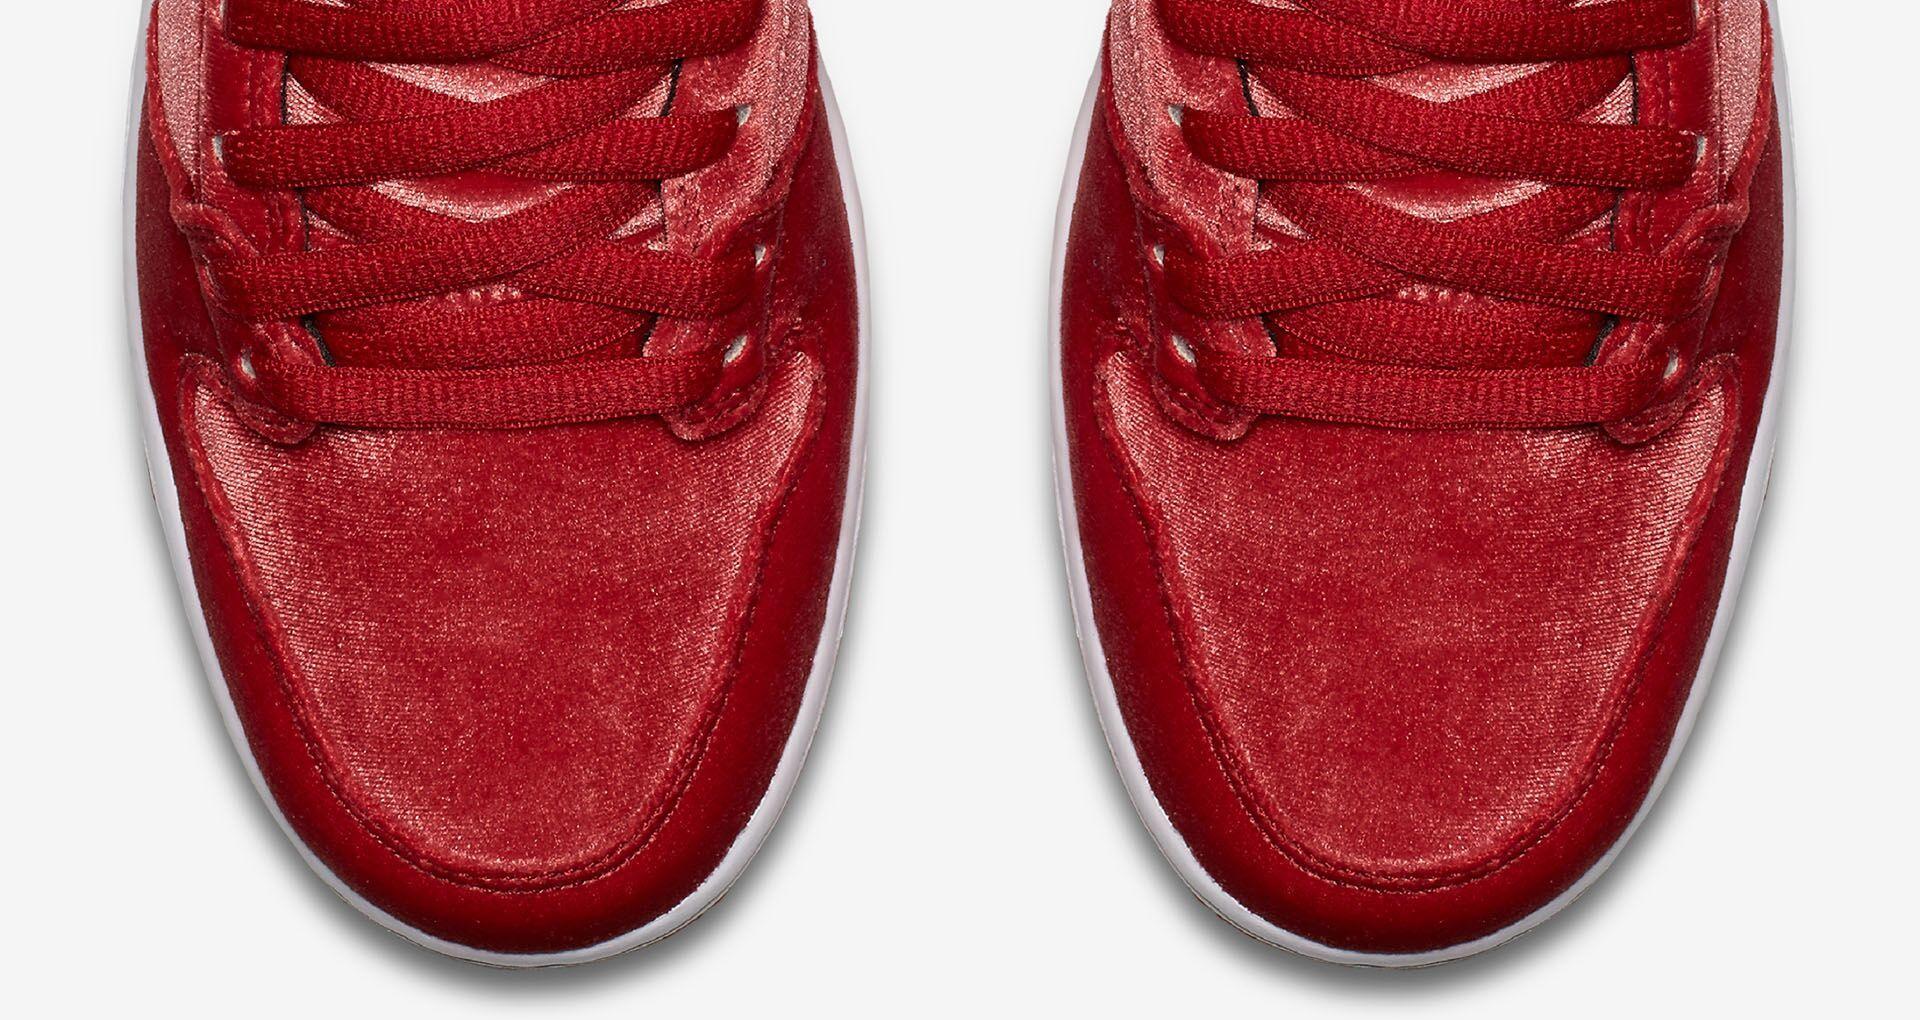 46c9b8004a3 Nike SB Dunk High Premium  Red Velvet . Release Date. Nike+ SNKRS